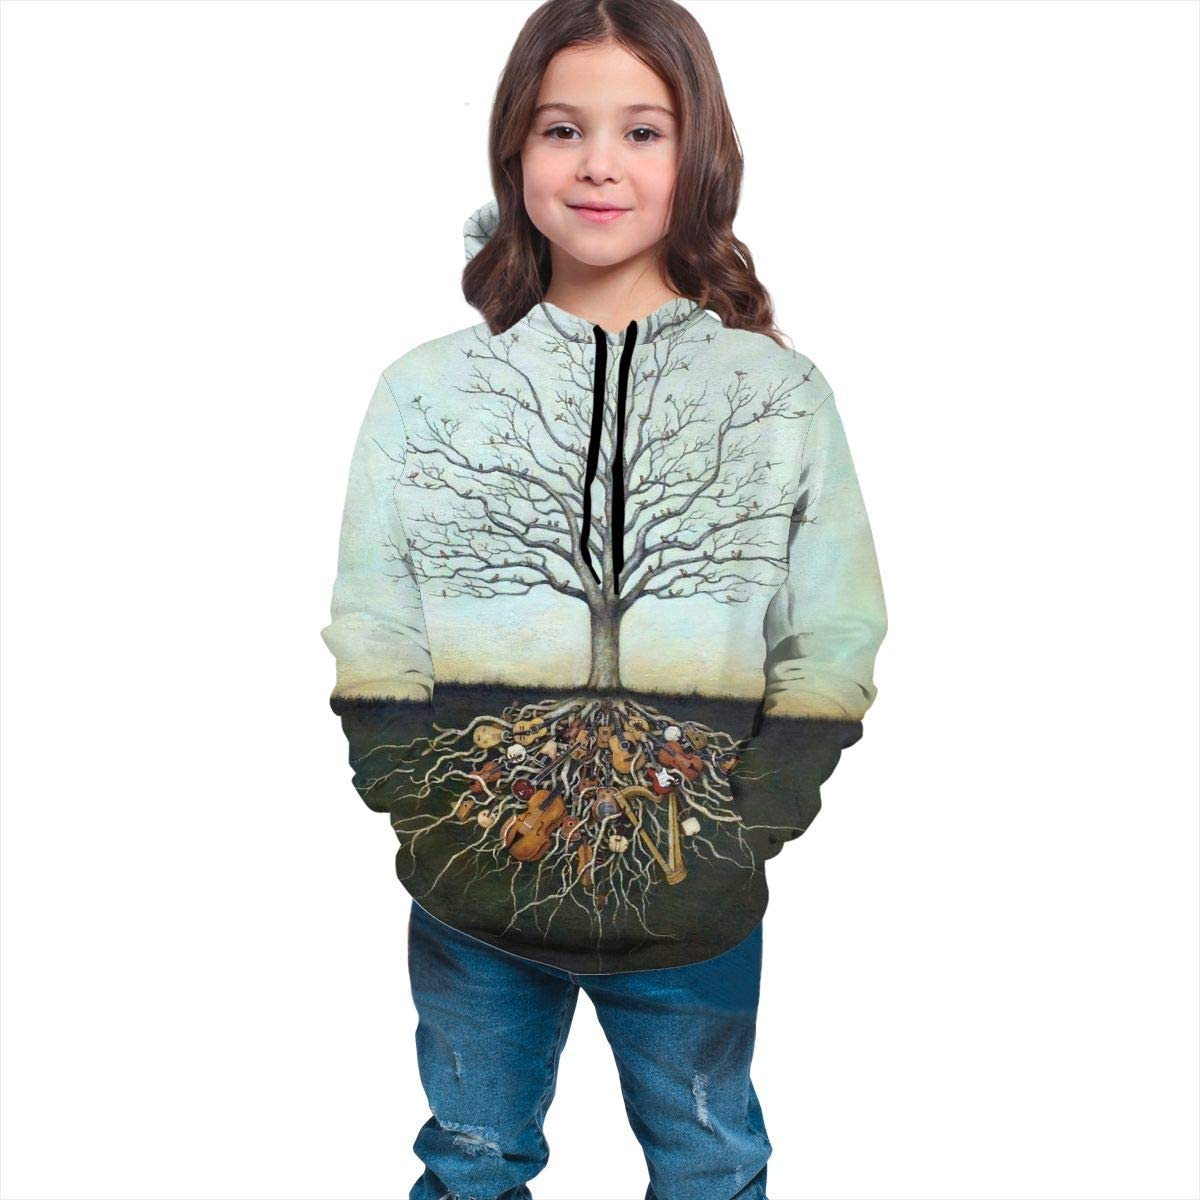 Kjiurhfyheuij Teen Pullover Hoodies with Pocket Music Tree Life Soft Fleece Hooded Sweatshirt for Youth Teens Kids Boys Girls